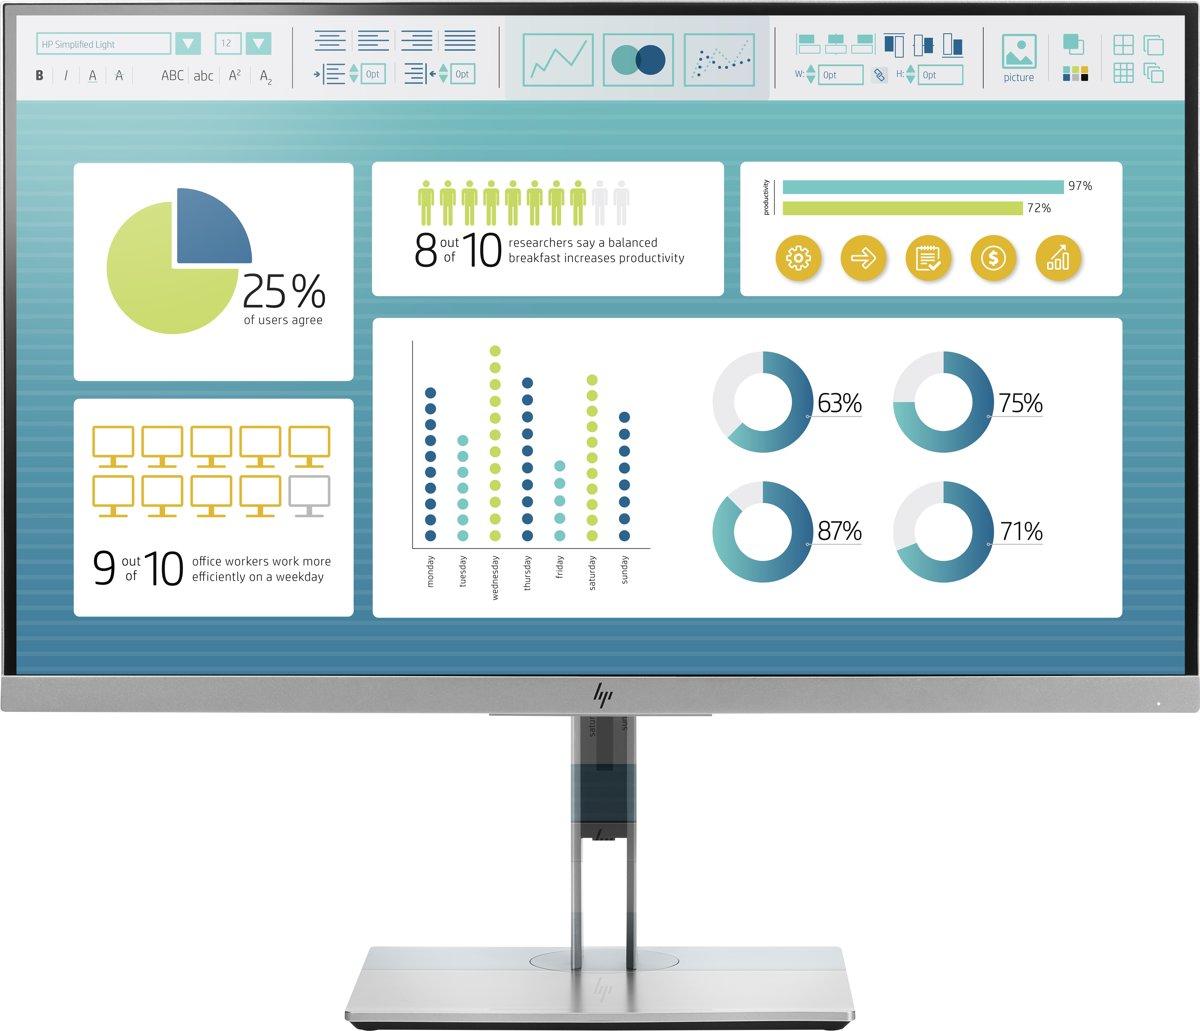 HP EliteDisplay E273 LED-monitor 68.6 cm (27 inch) Energielabel A+ (A+ - F) 1920 x 1080 pix Full HD 5 ms DisplayPort, HDMI, VGA, USB 3.0 IPS LED